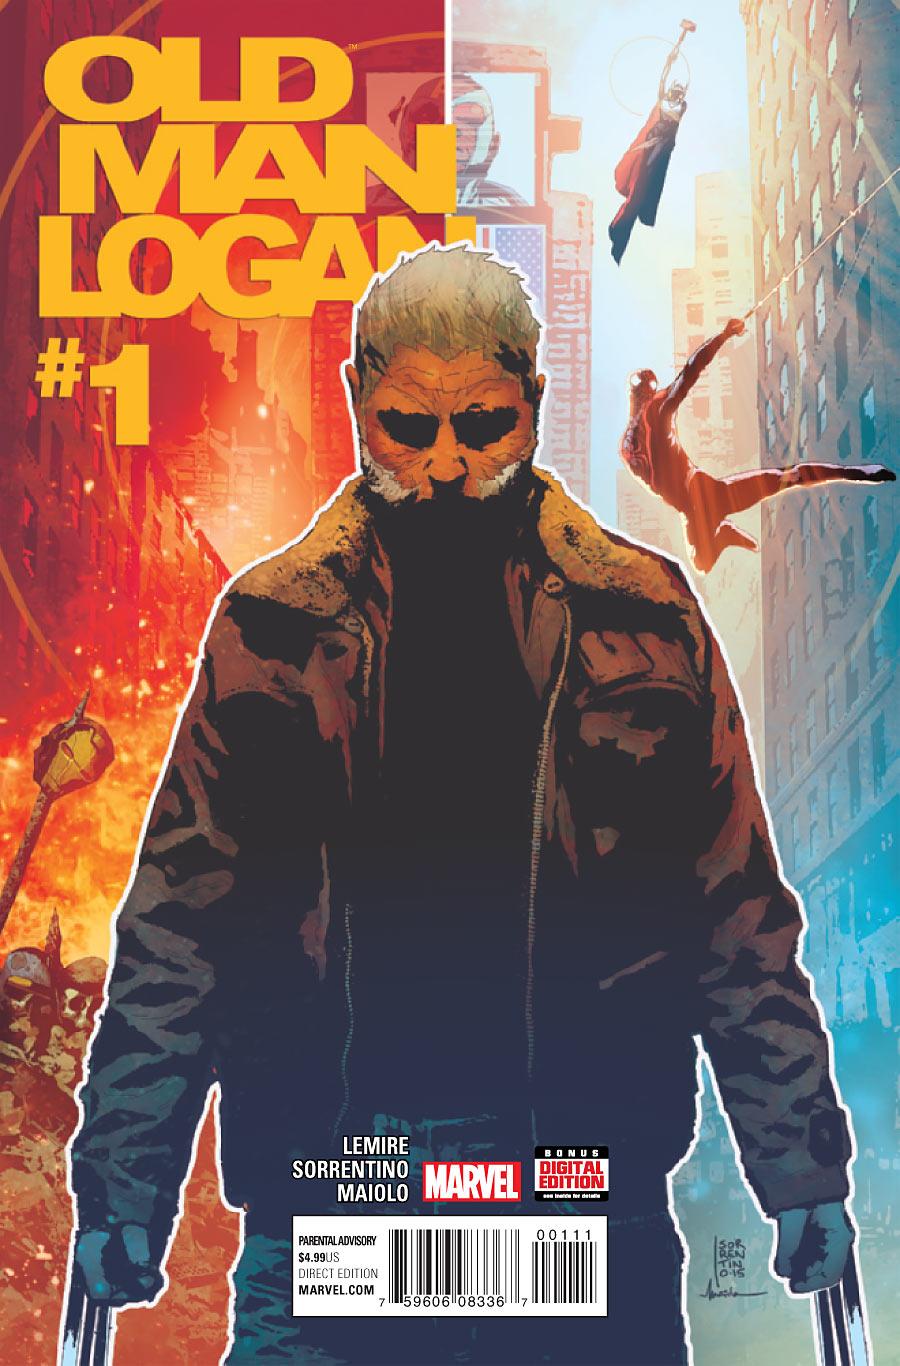 Old Man Logan 1 - Berseker